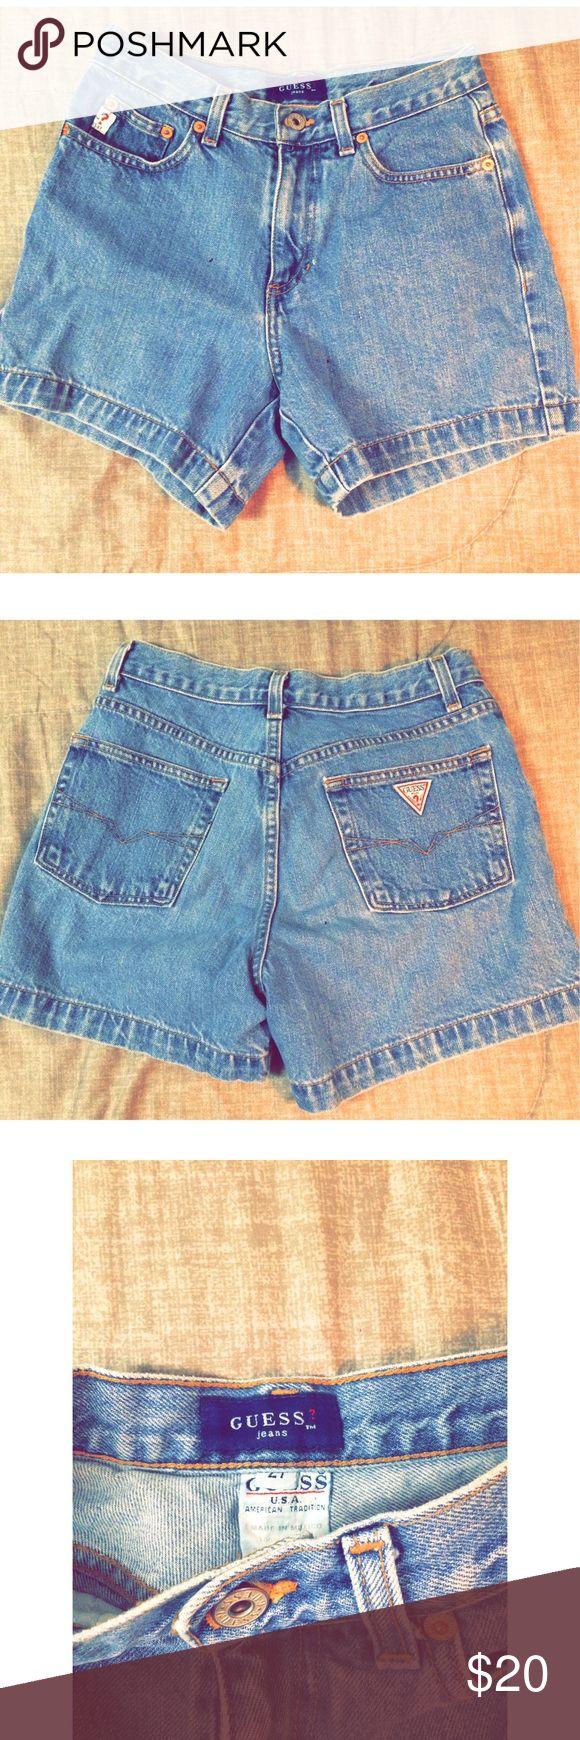 Vintage Guess Jeans Vintage guess jean shorts.  Highwasted. Size 27. Guess Shorts Jean Shorts